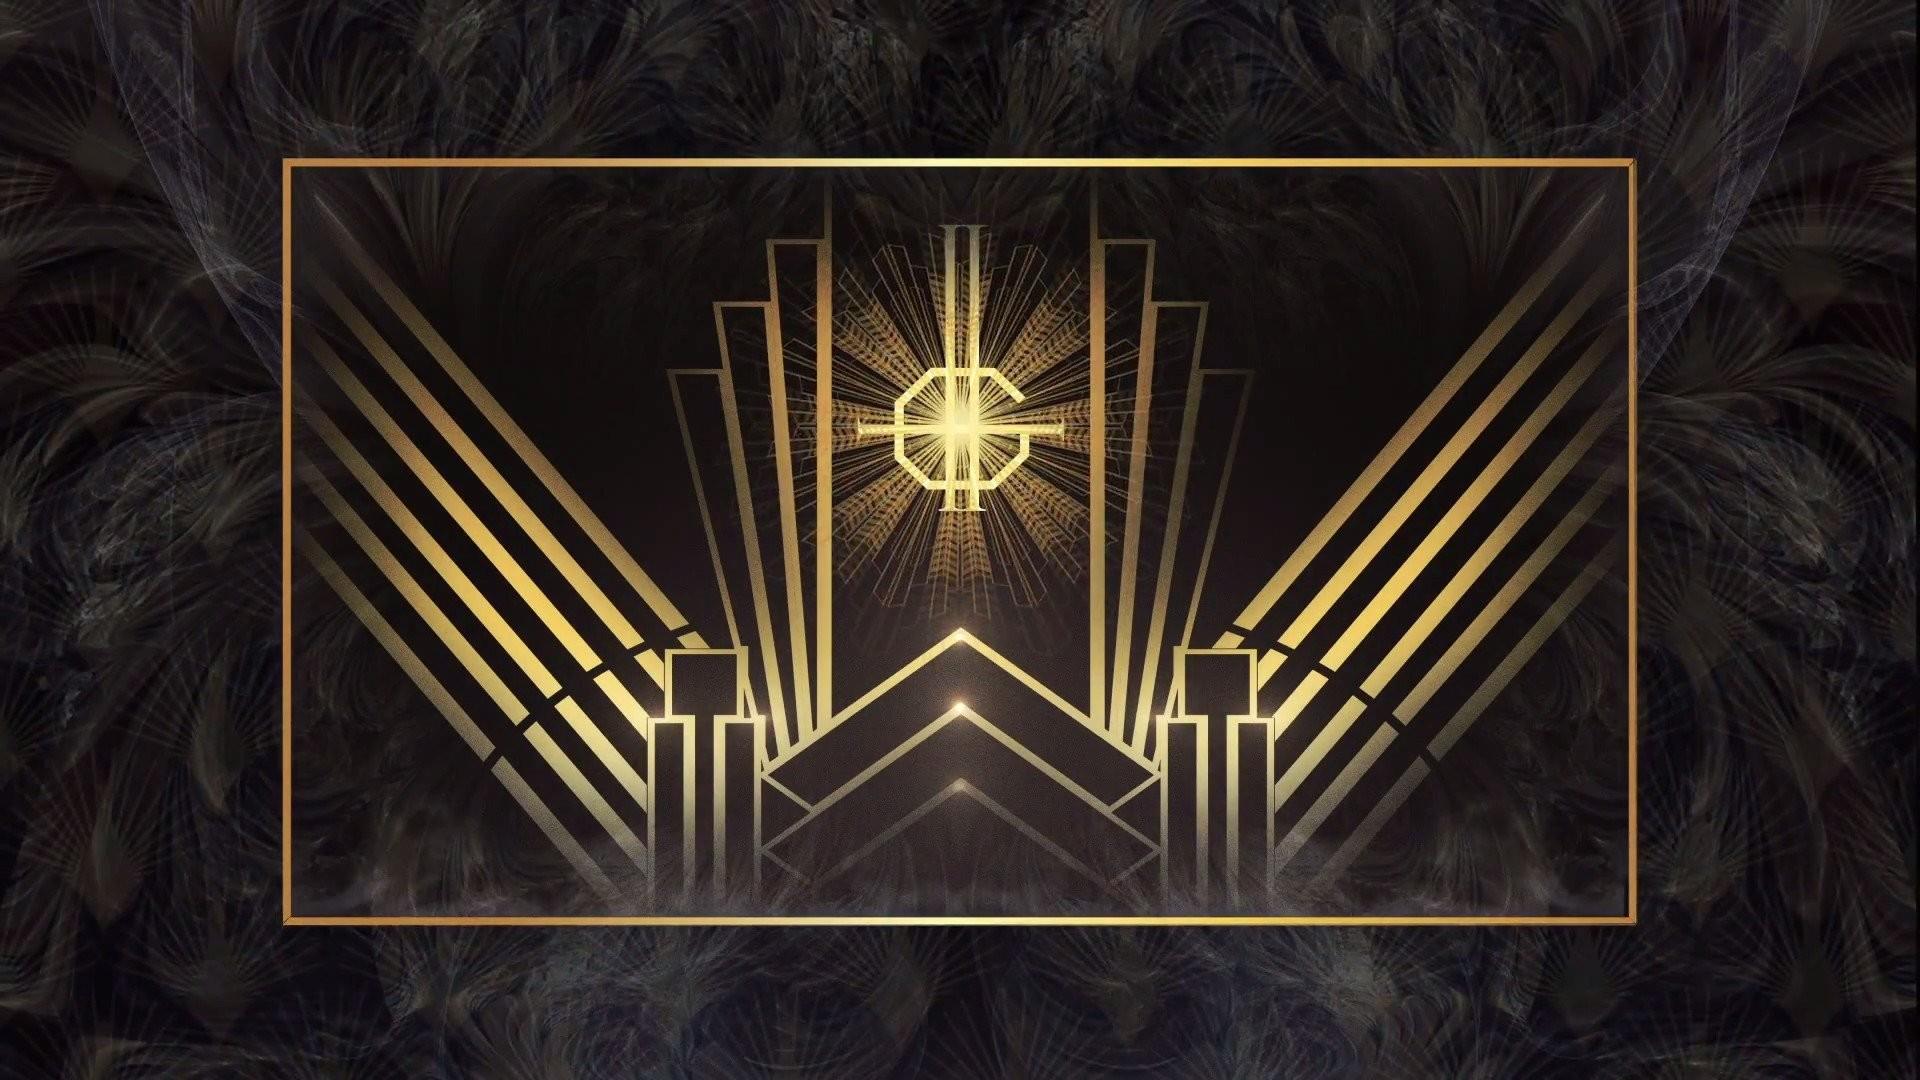 Music – Ghost B.C. Heavy Metal Wallpaper